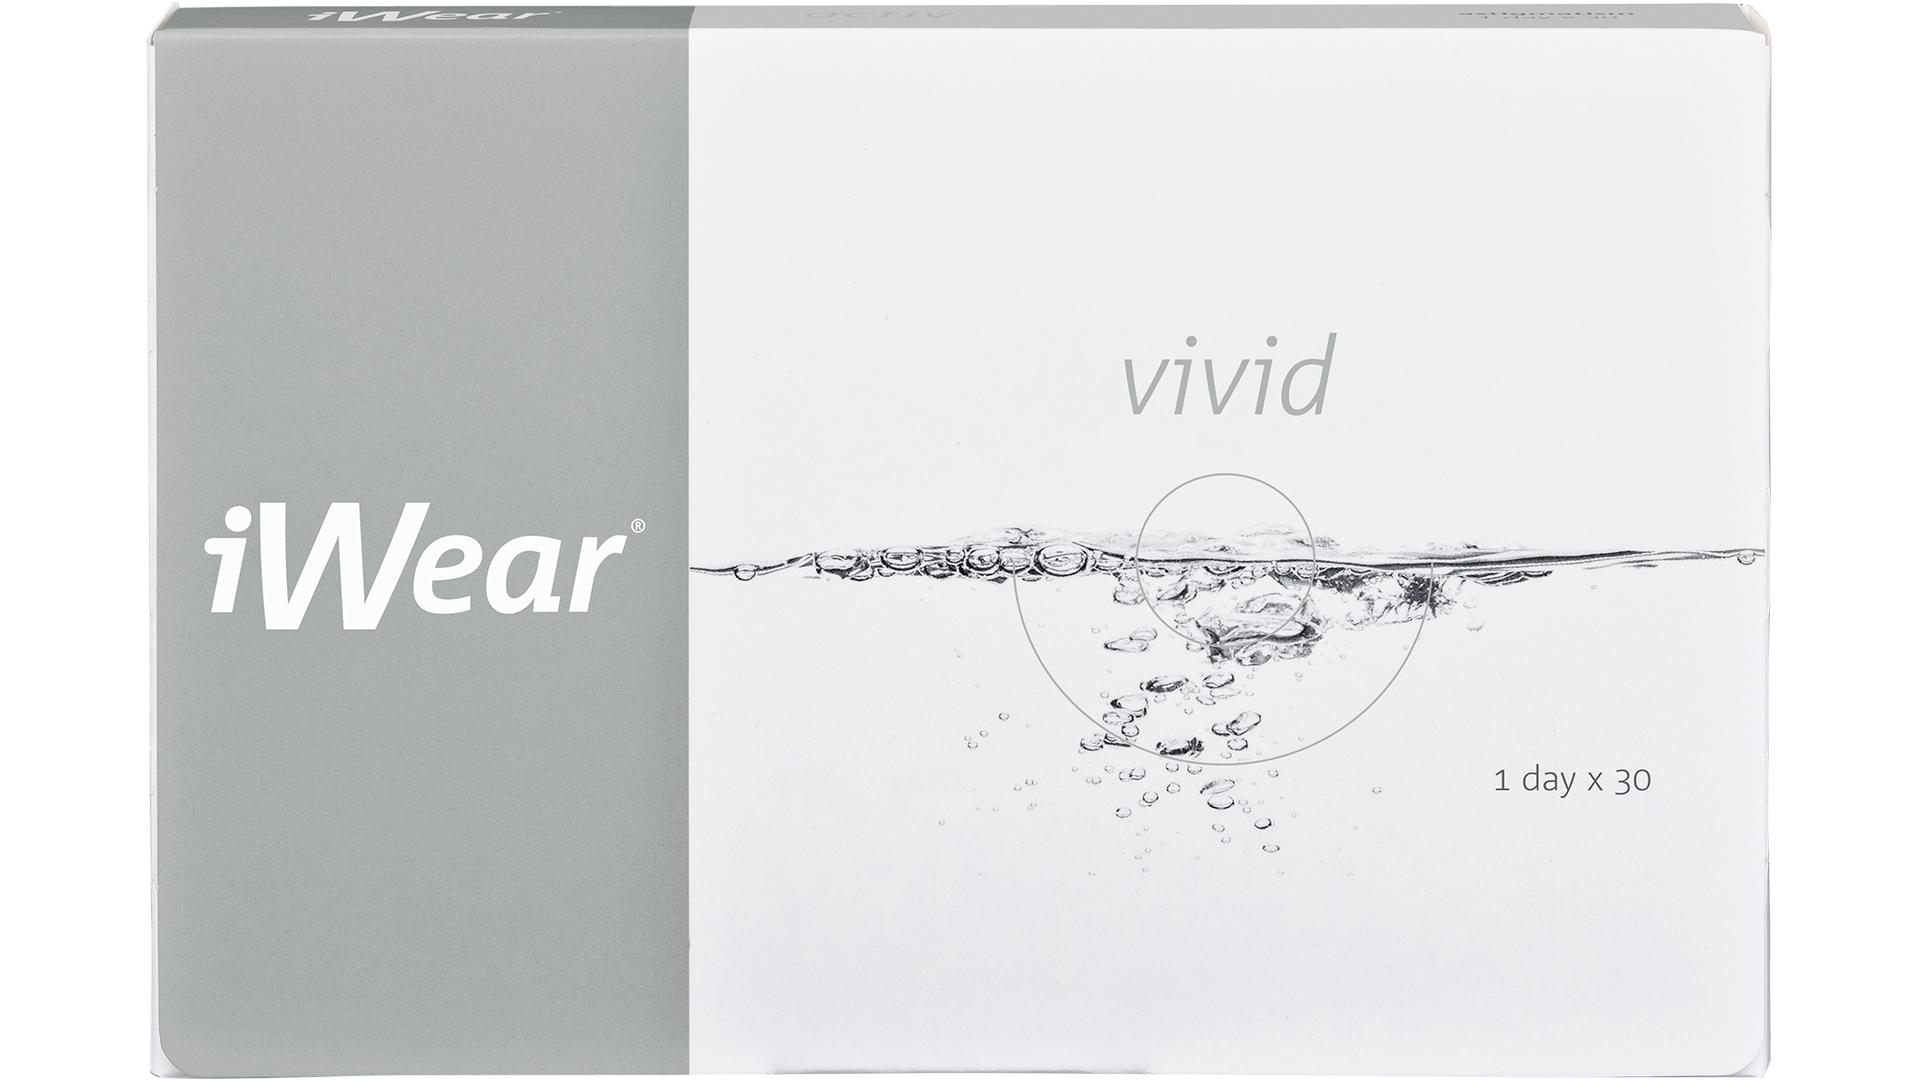 Front iWear vivid